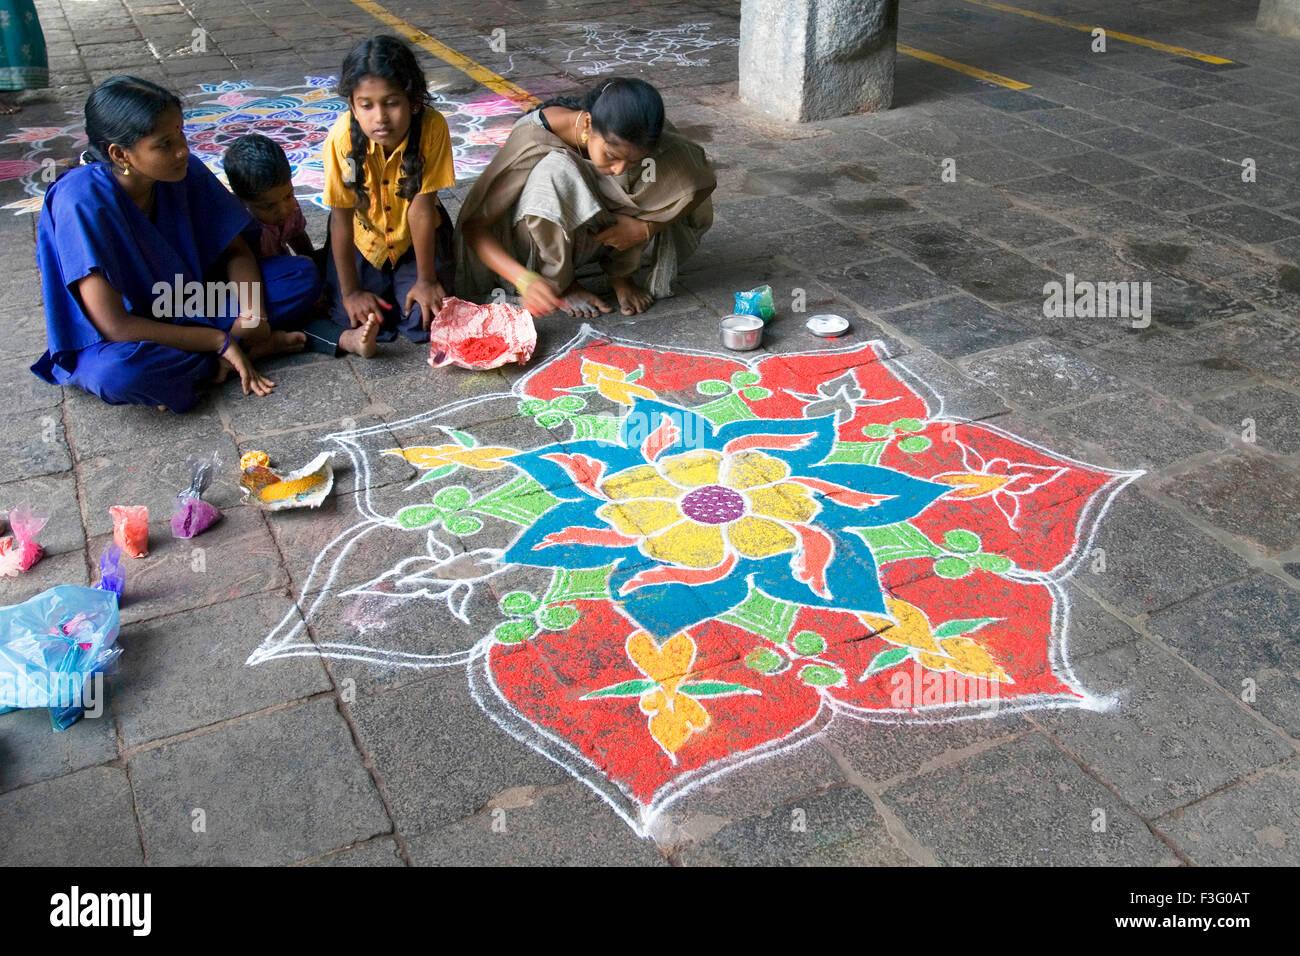 Kolam auspicious art of decorating courtyards of temples ; Tamil Nadu ; India - Stock Image